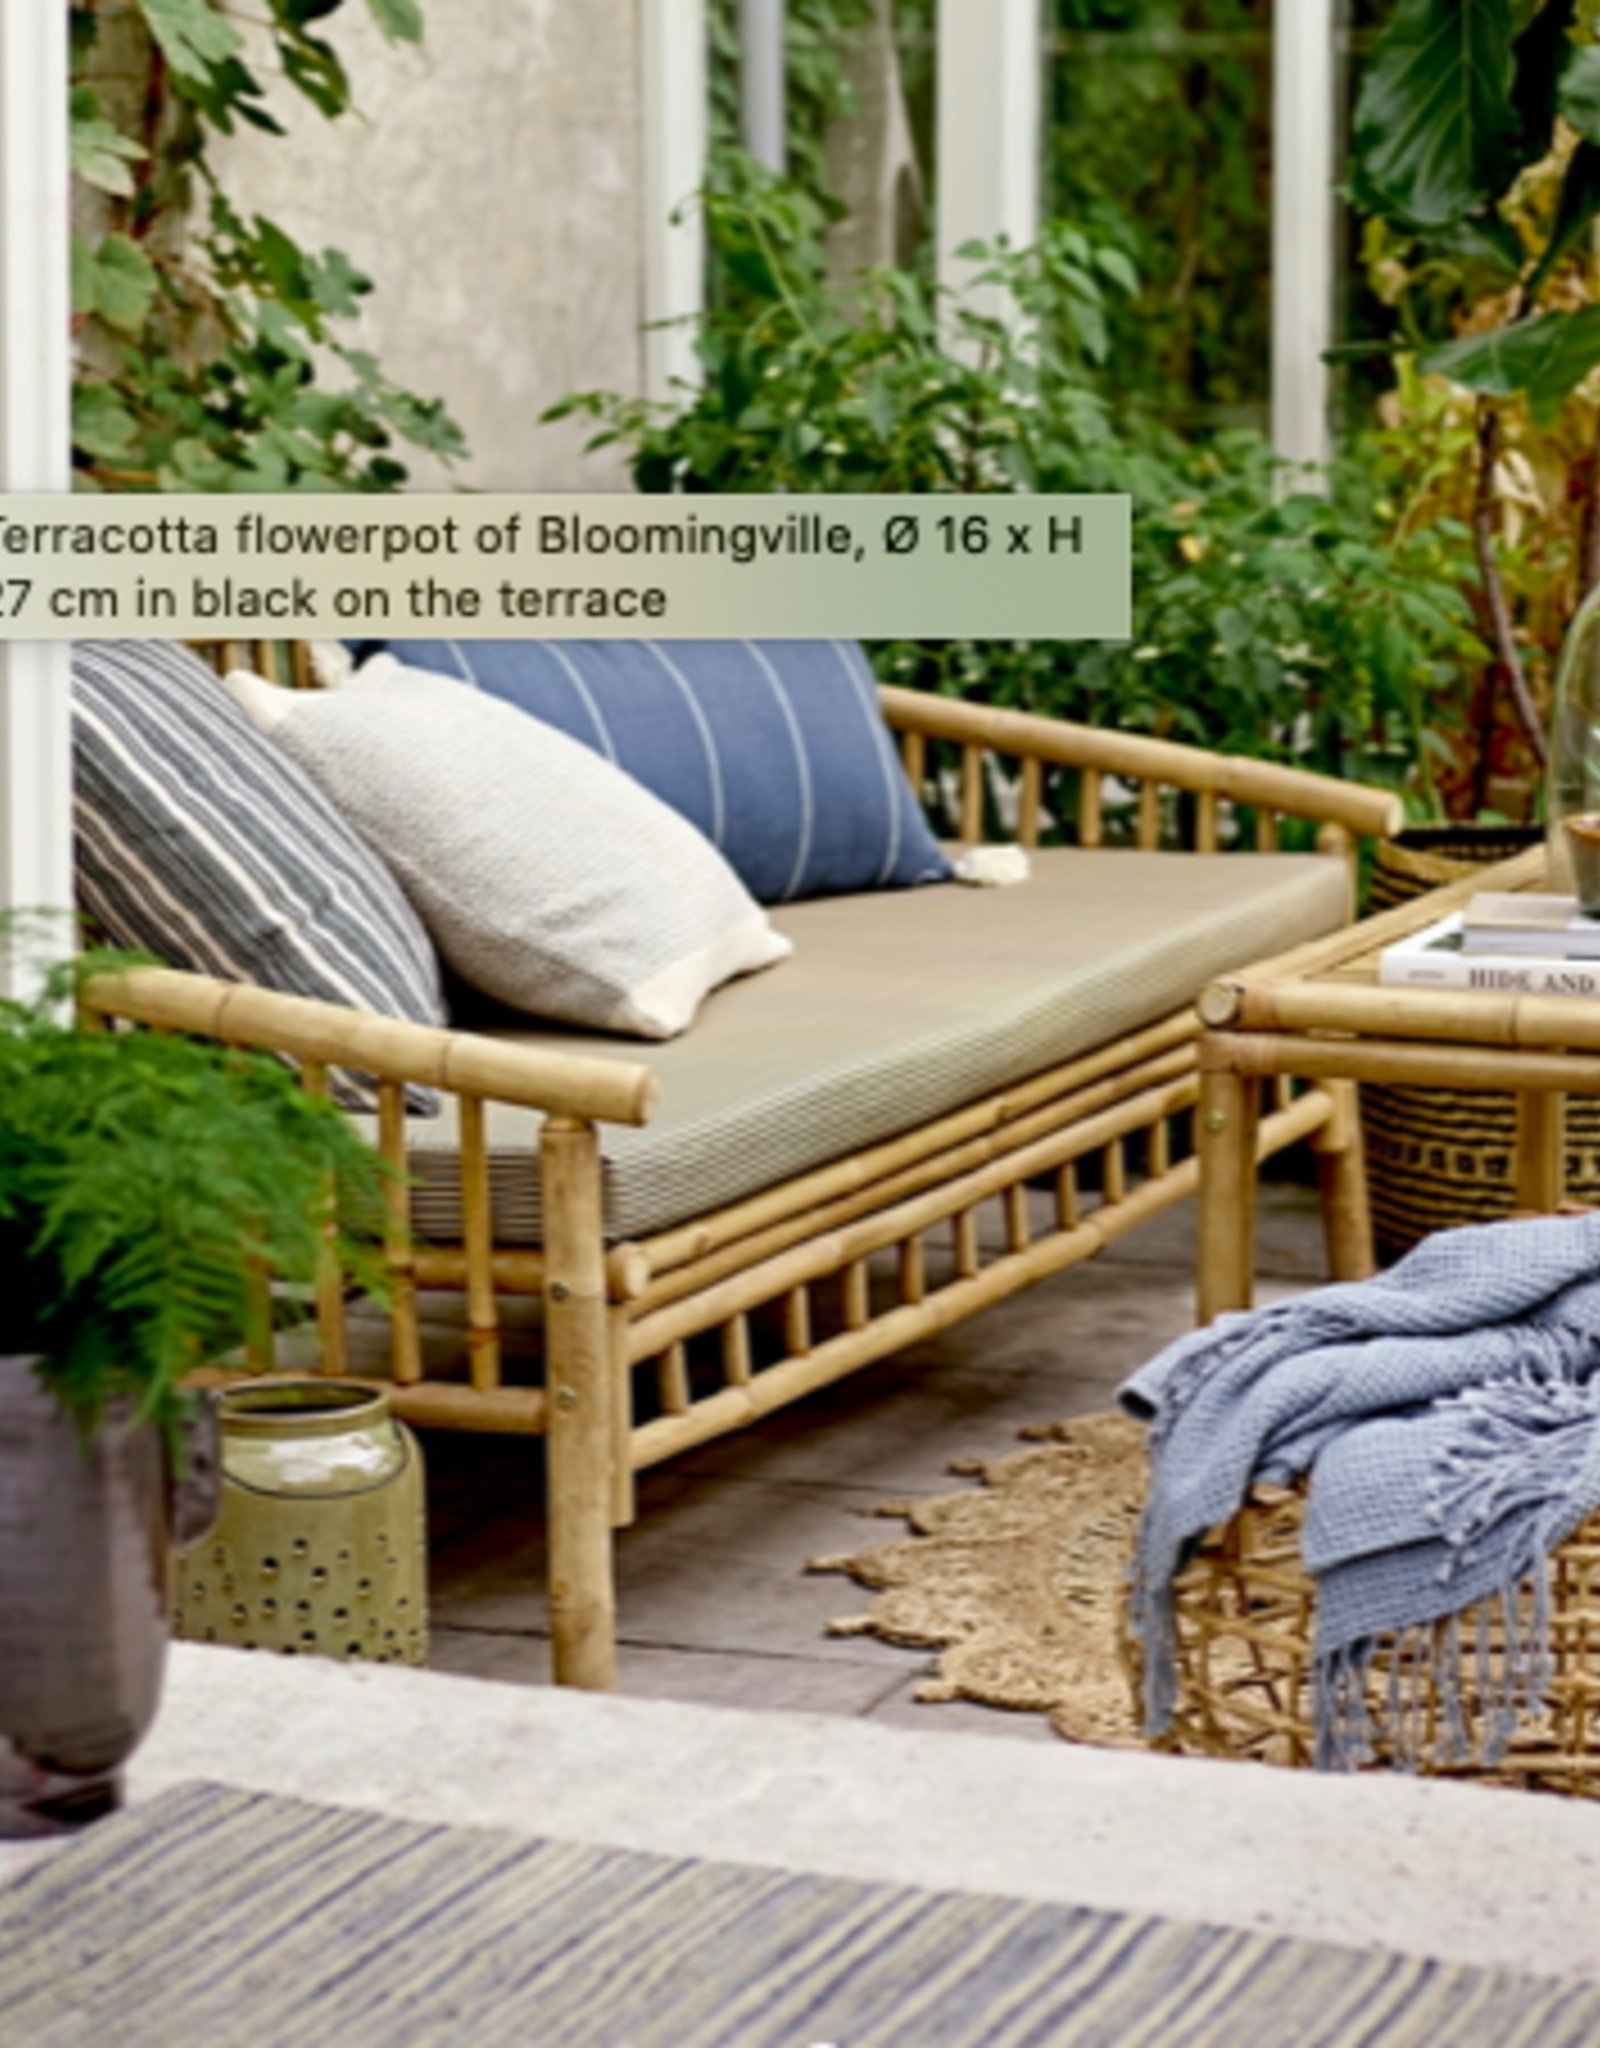 Bloomingville Bloomingville - deco flowerpot black terracotta L